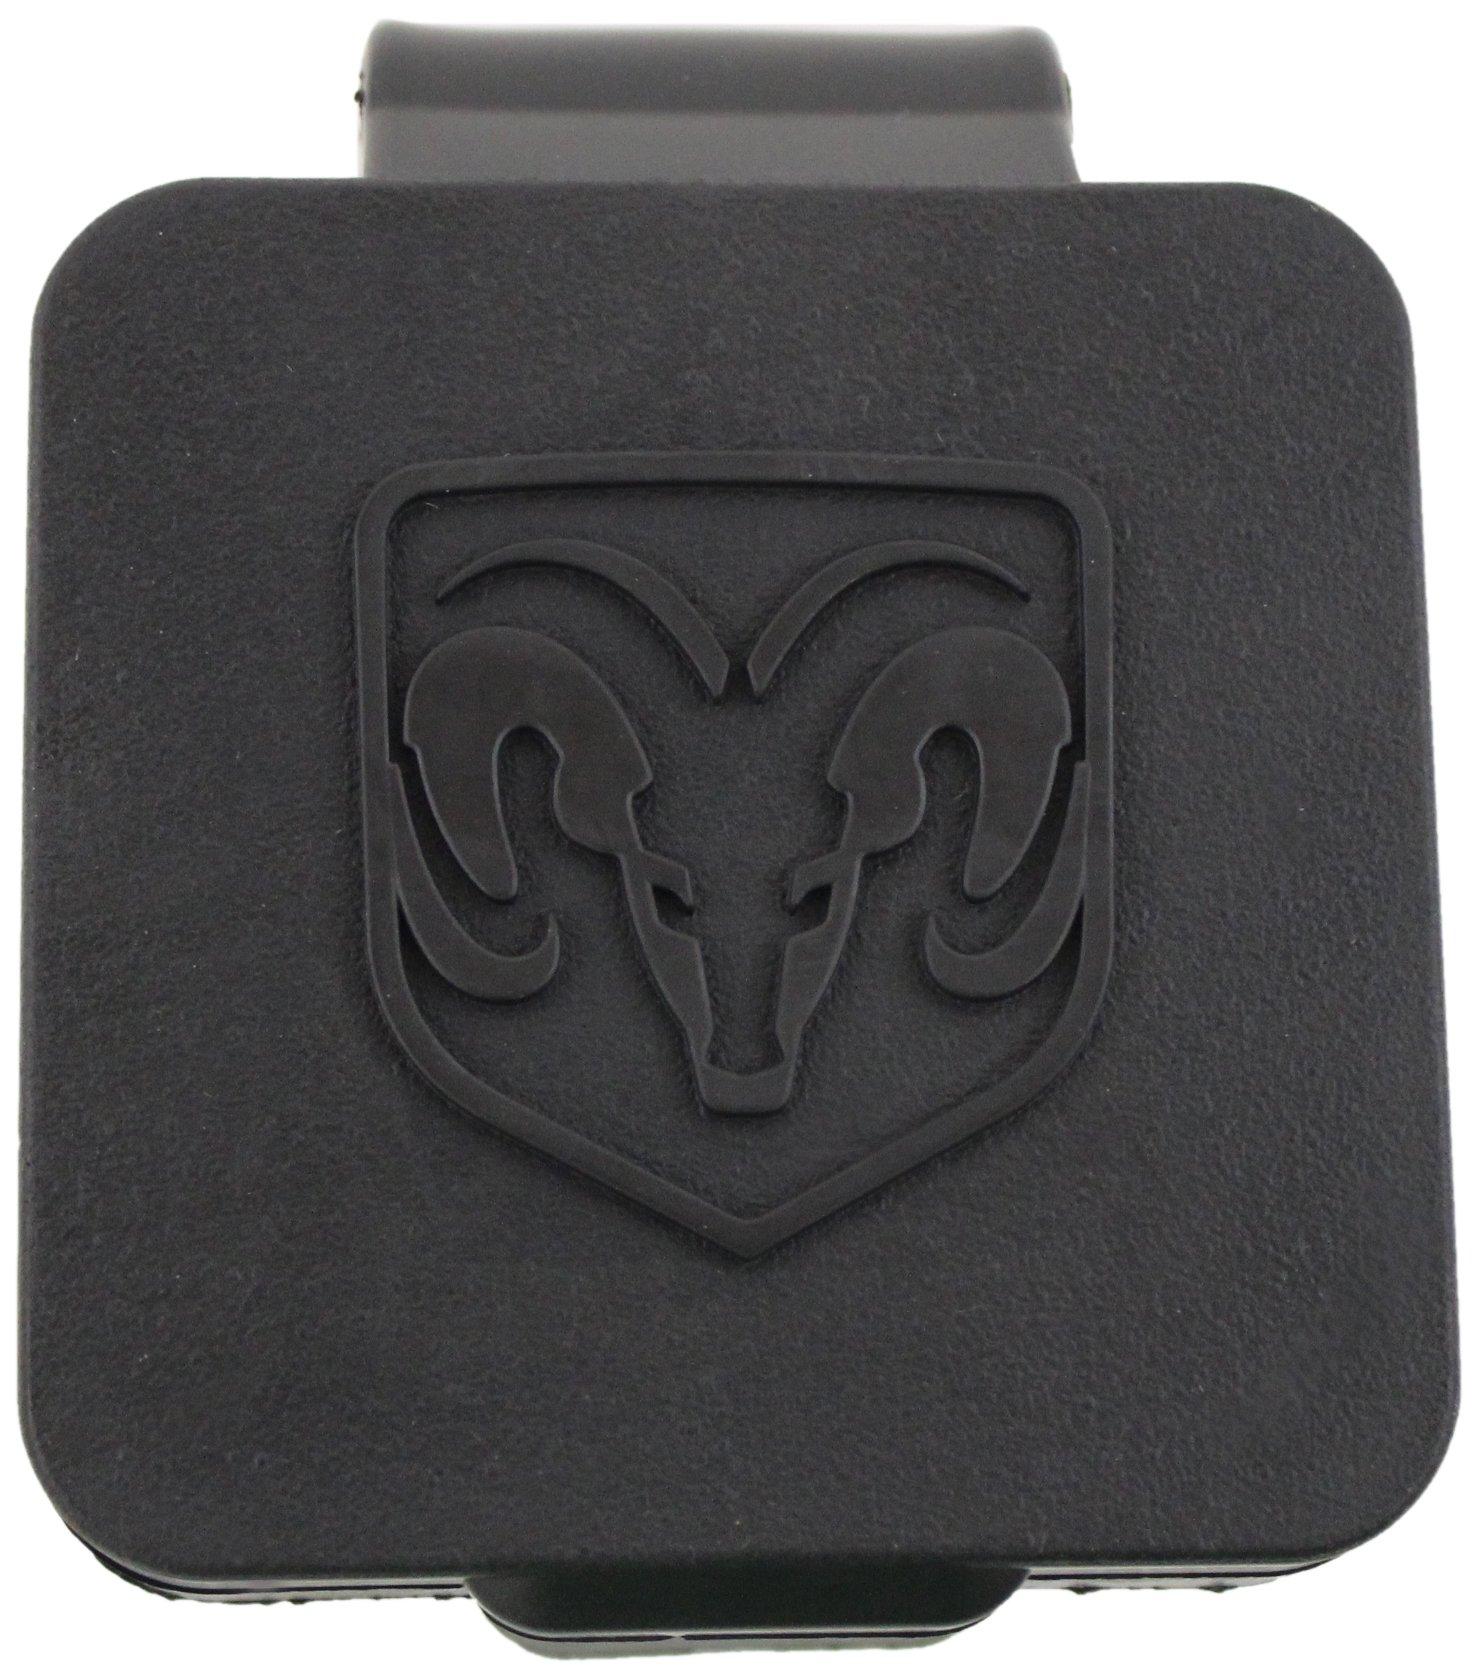 Genuine Dodge RAM Accessories 82208454AB Hitch Receiver Plug with RAM's Head Logo by Genuine Dodge